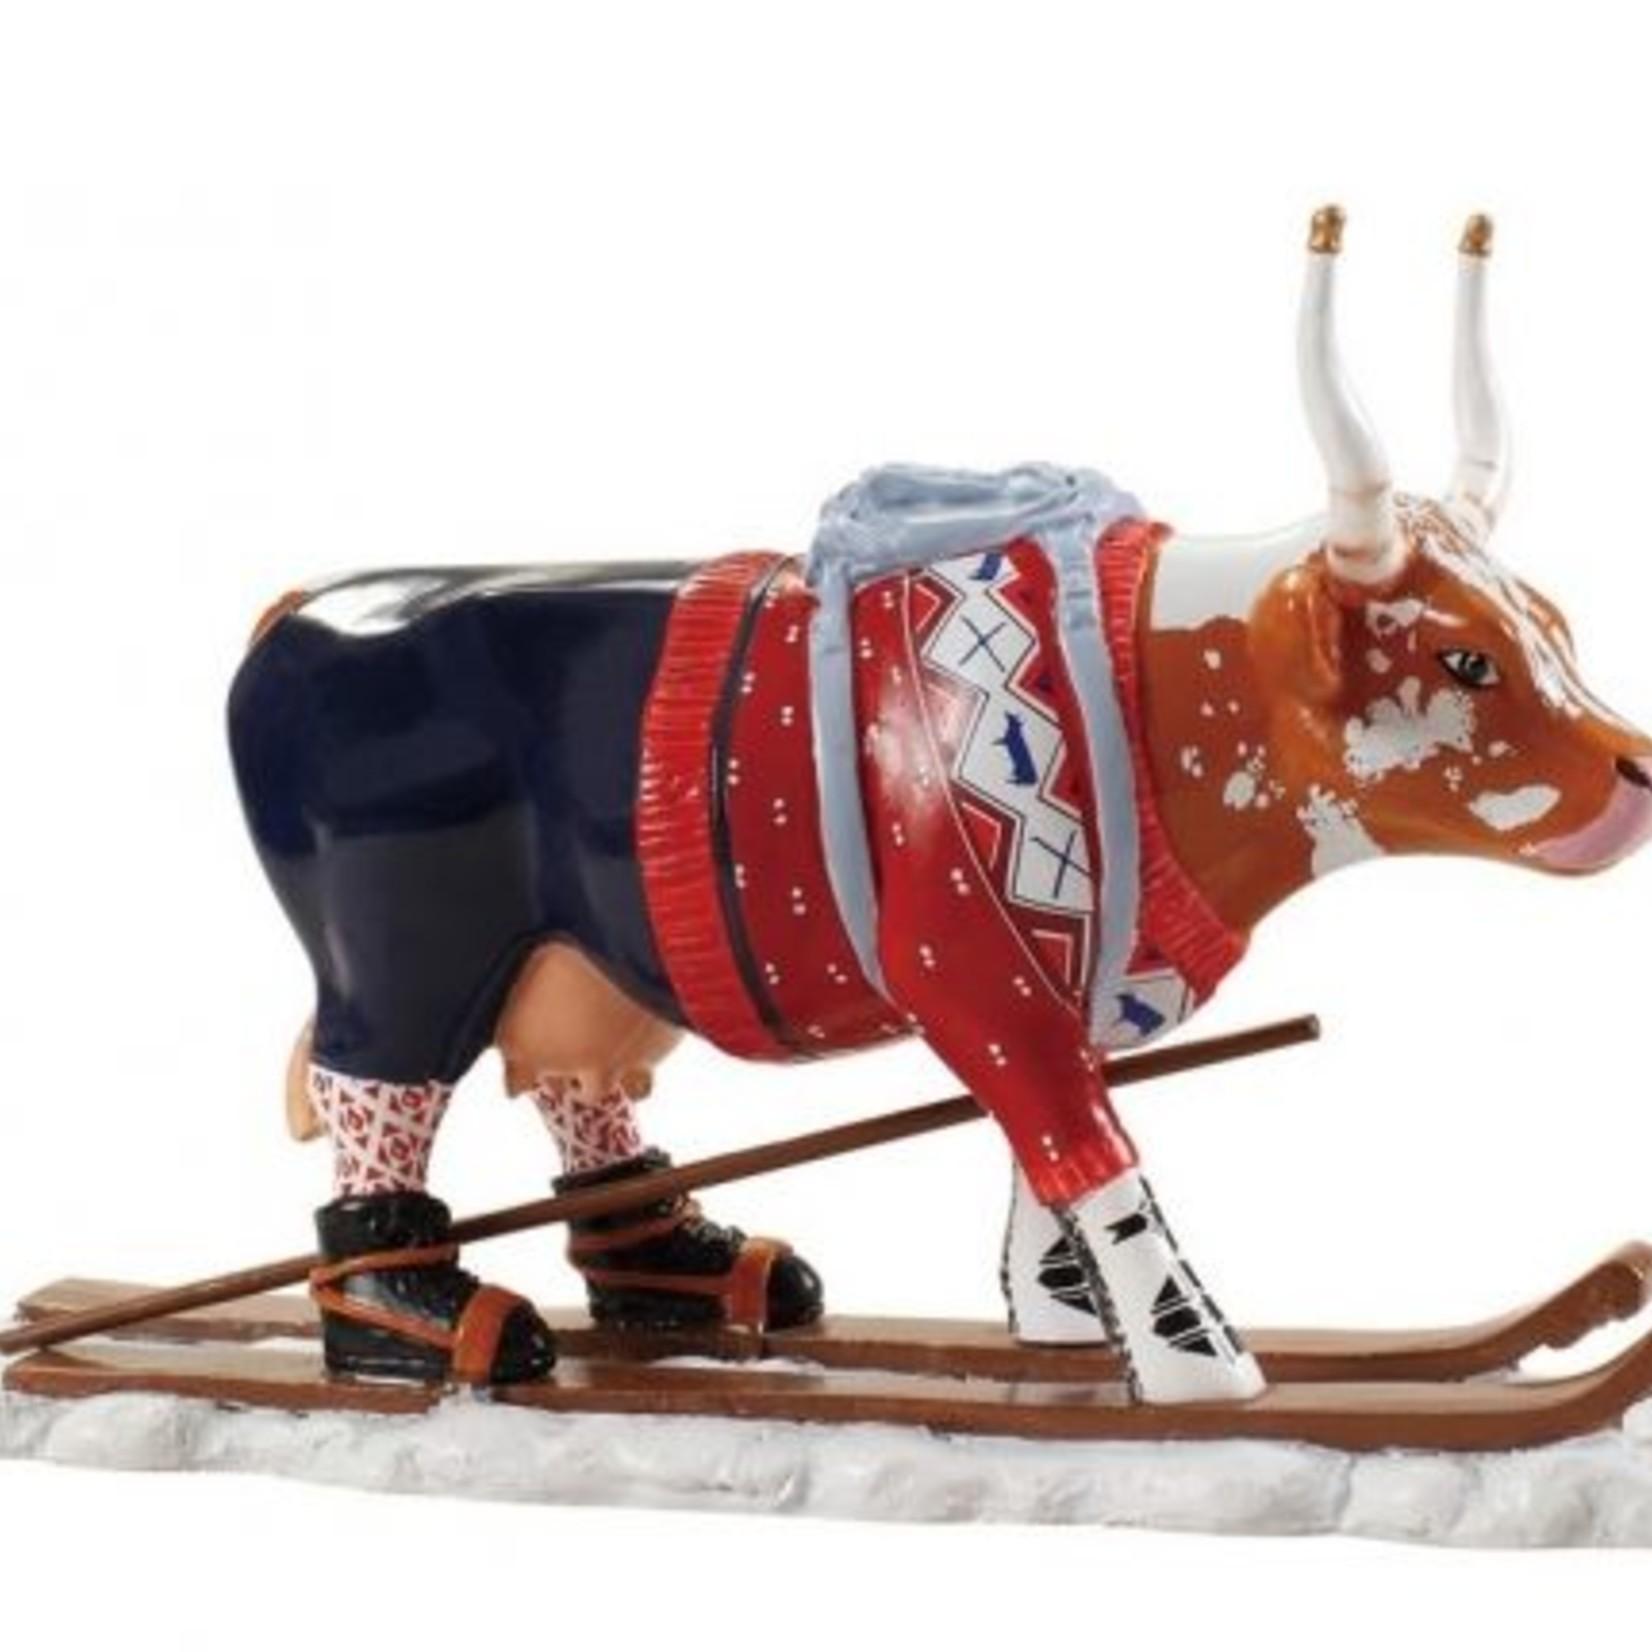 Cowparade Cowparade Medium Resin The Ski Cow